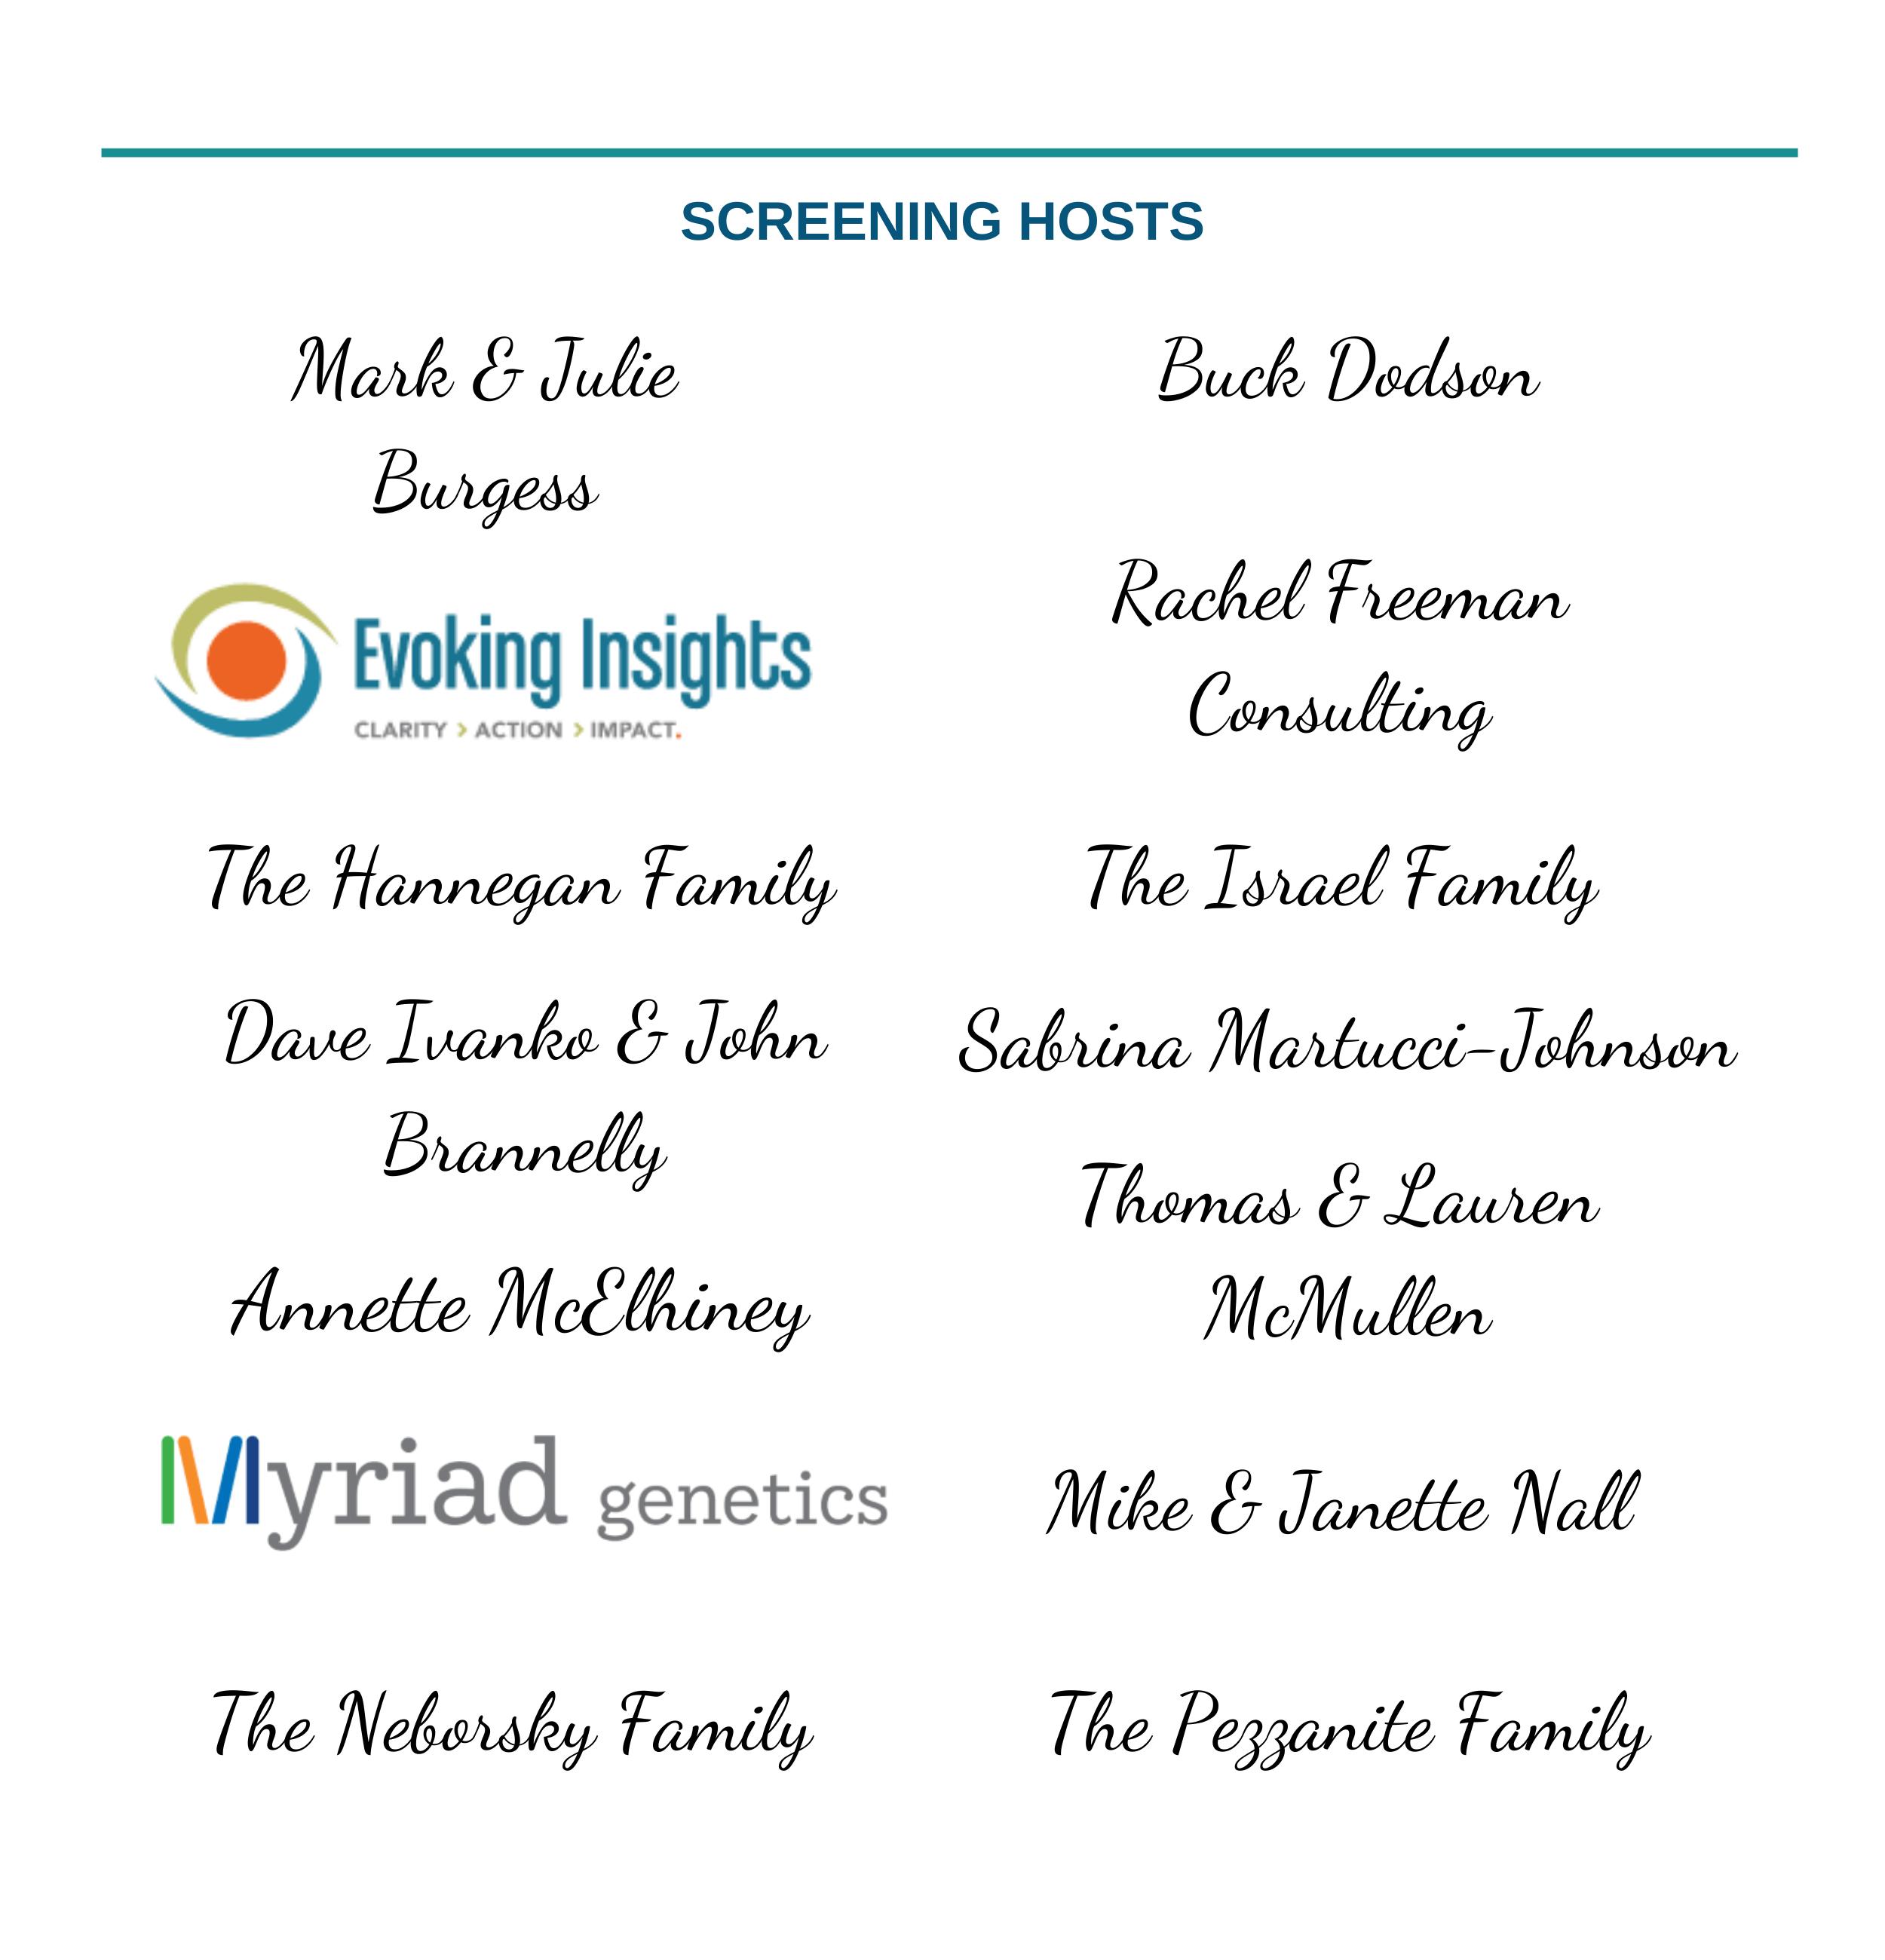 2021 Screening Hosts